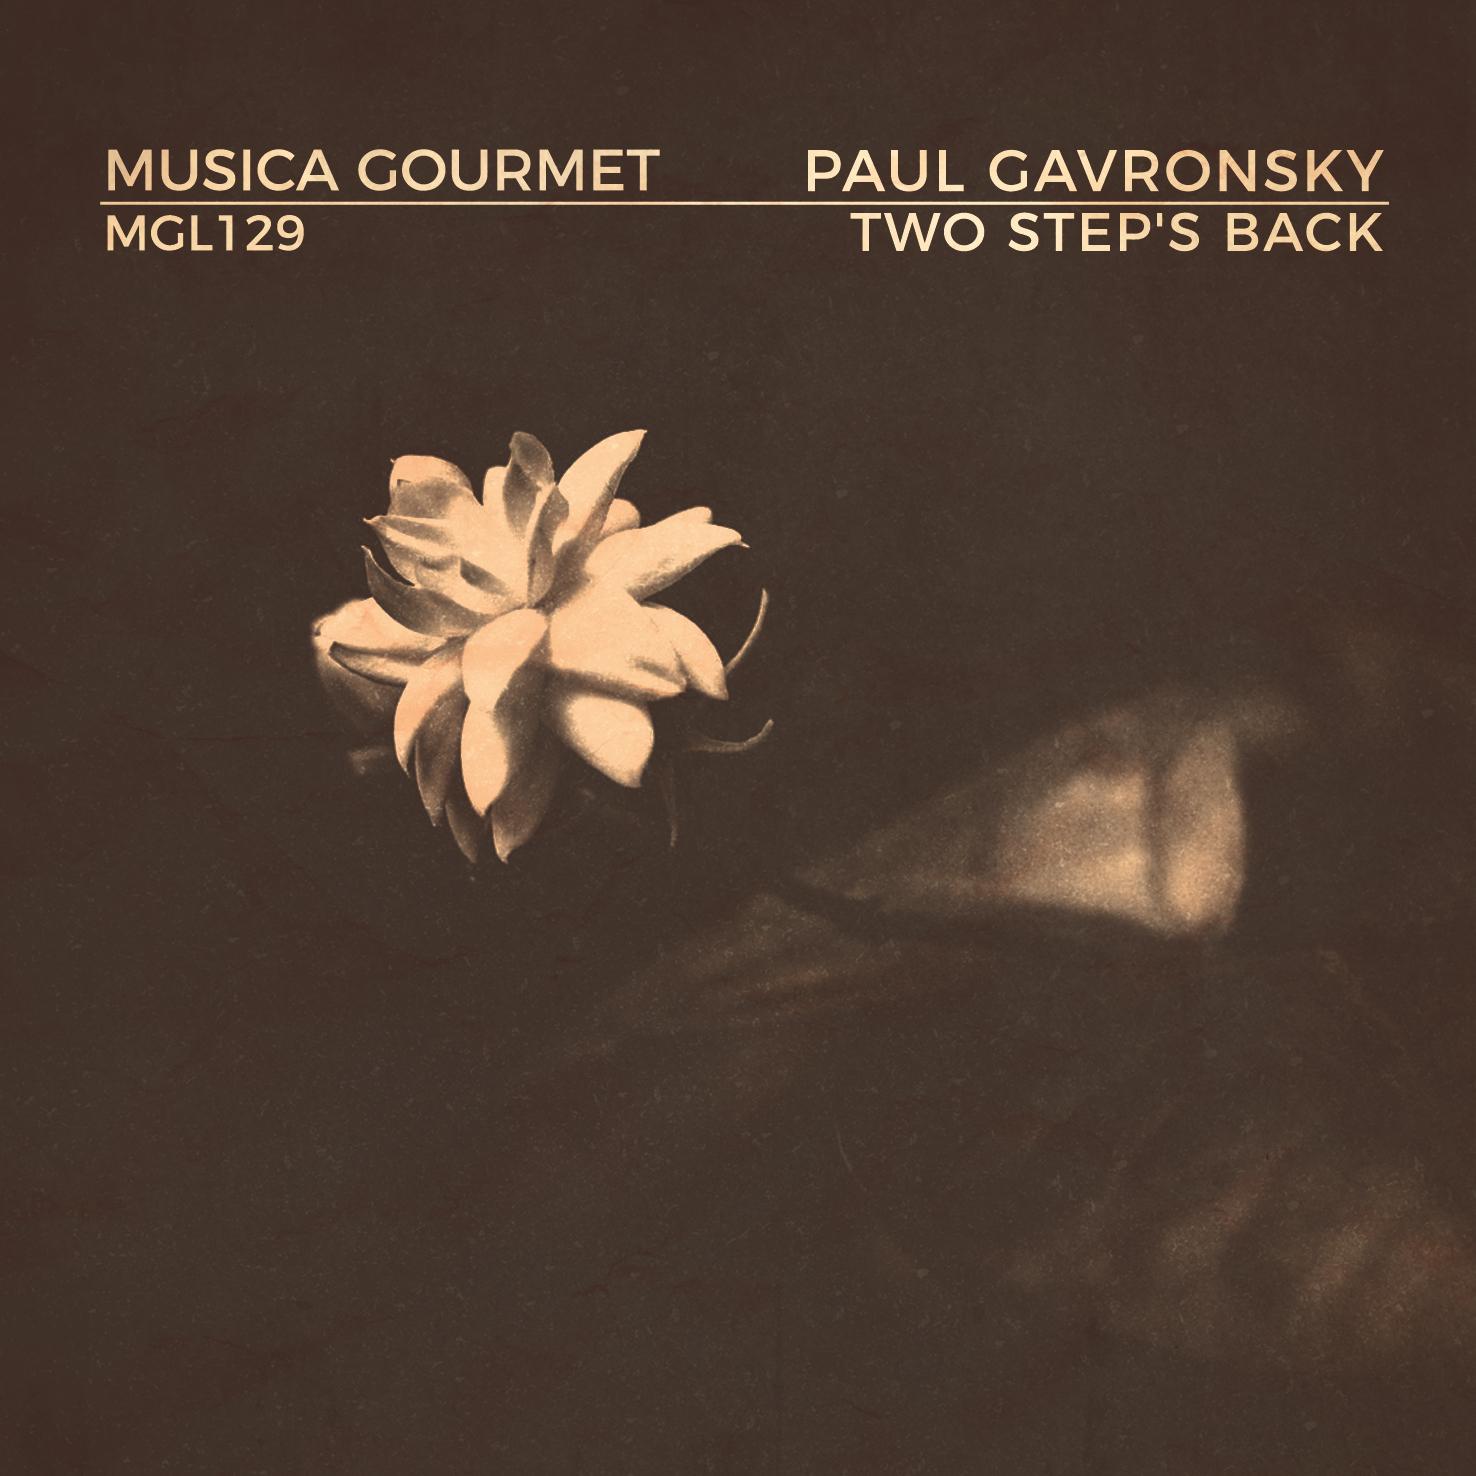 HOUSE MUSIC BY PAUL GAVRONSKY